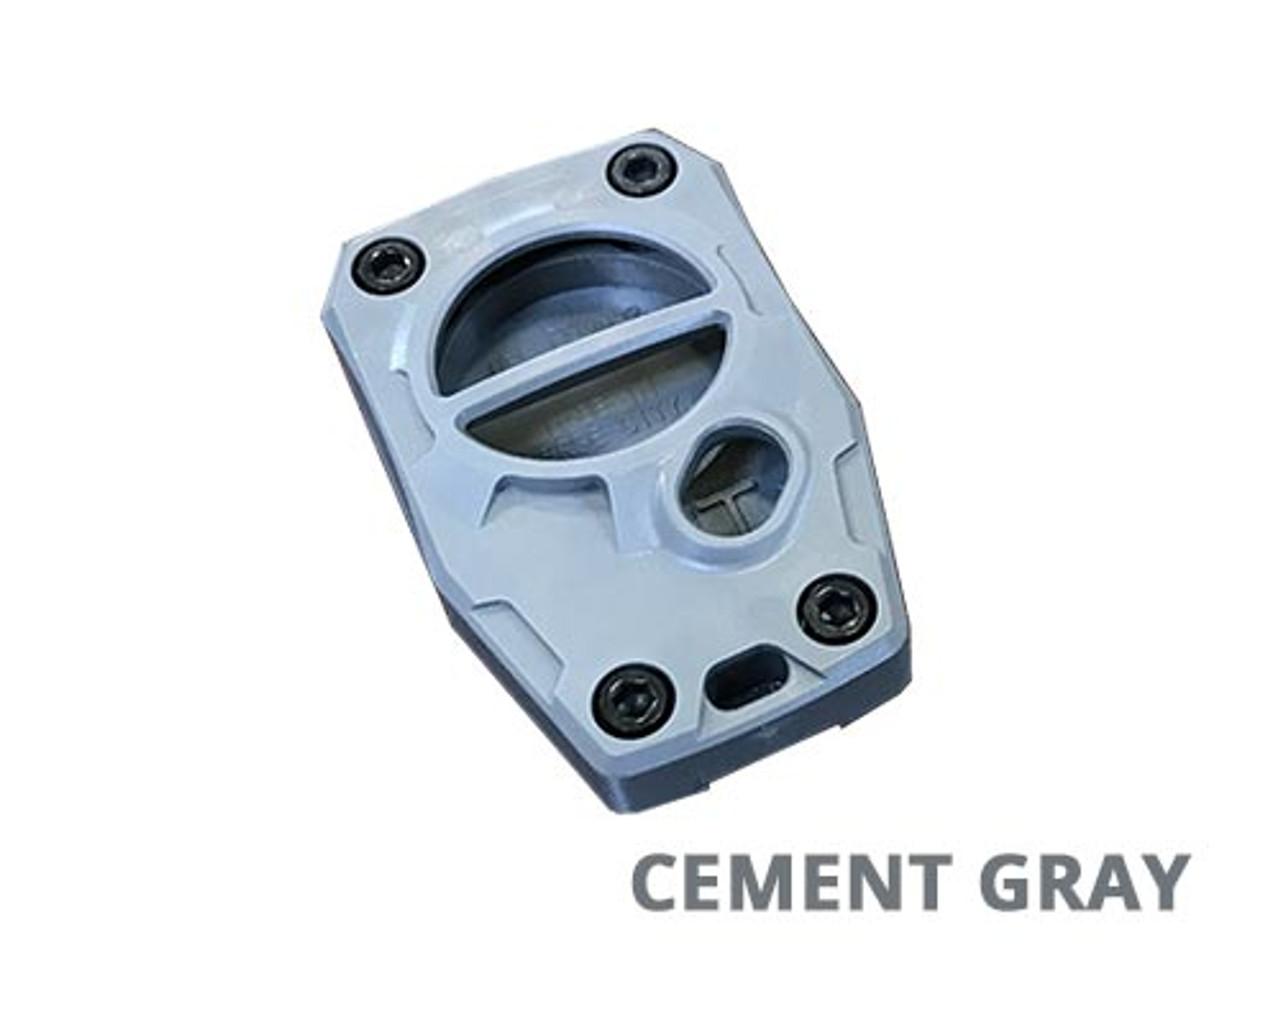 1 Cement Gray